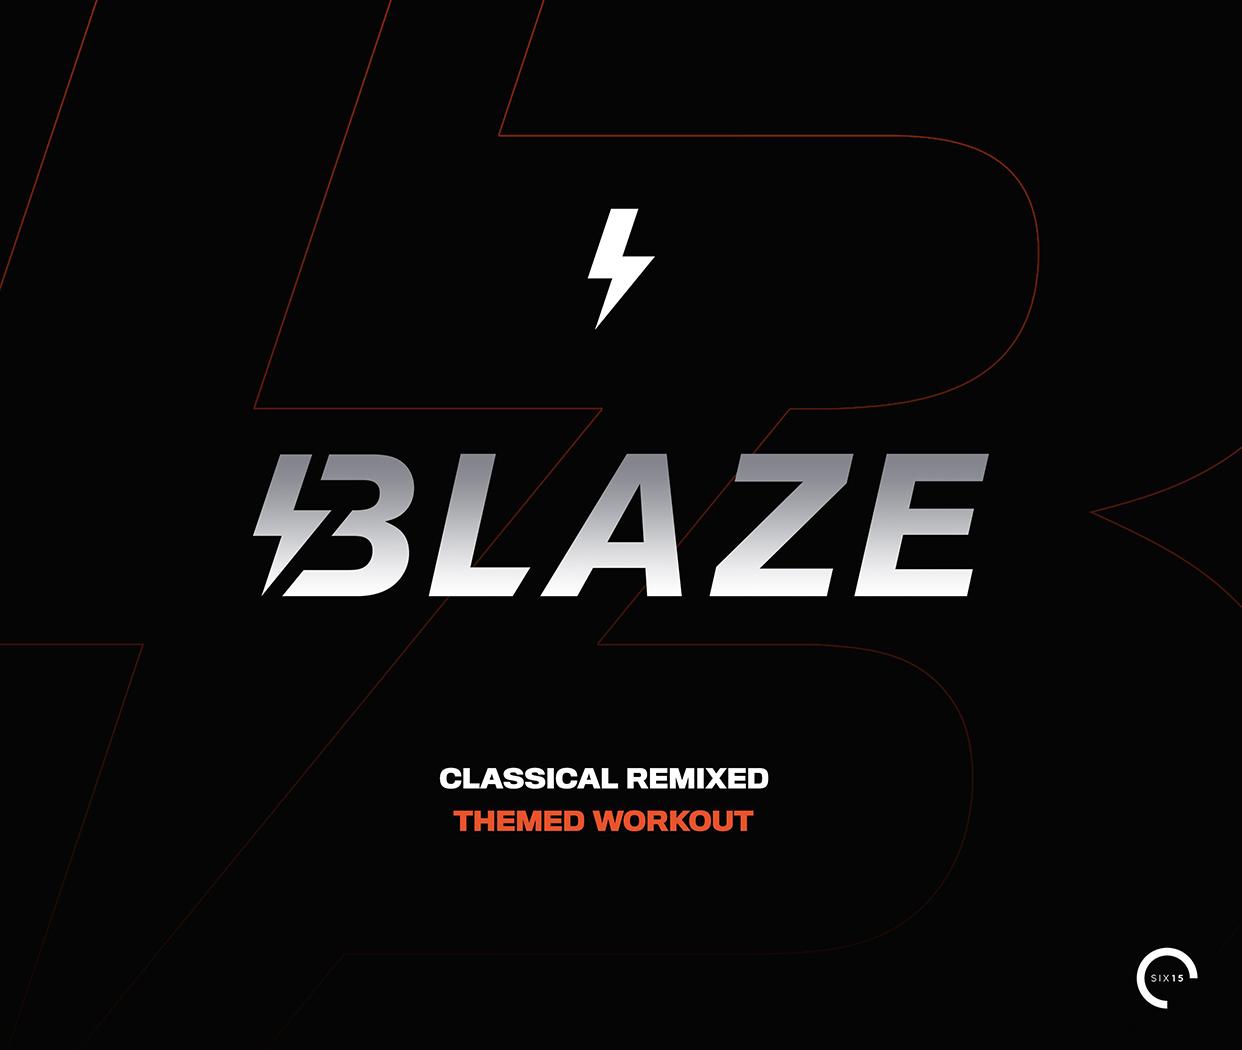 Blaze - Classical Remix!